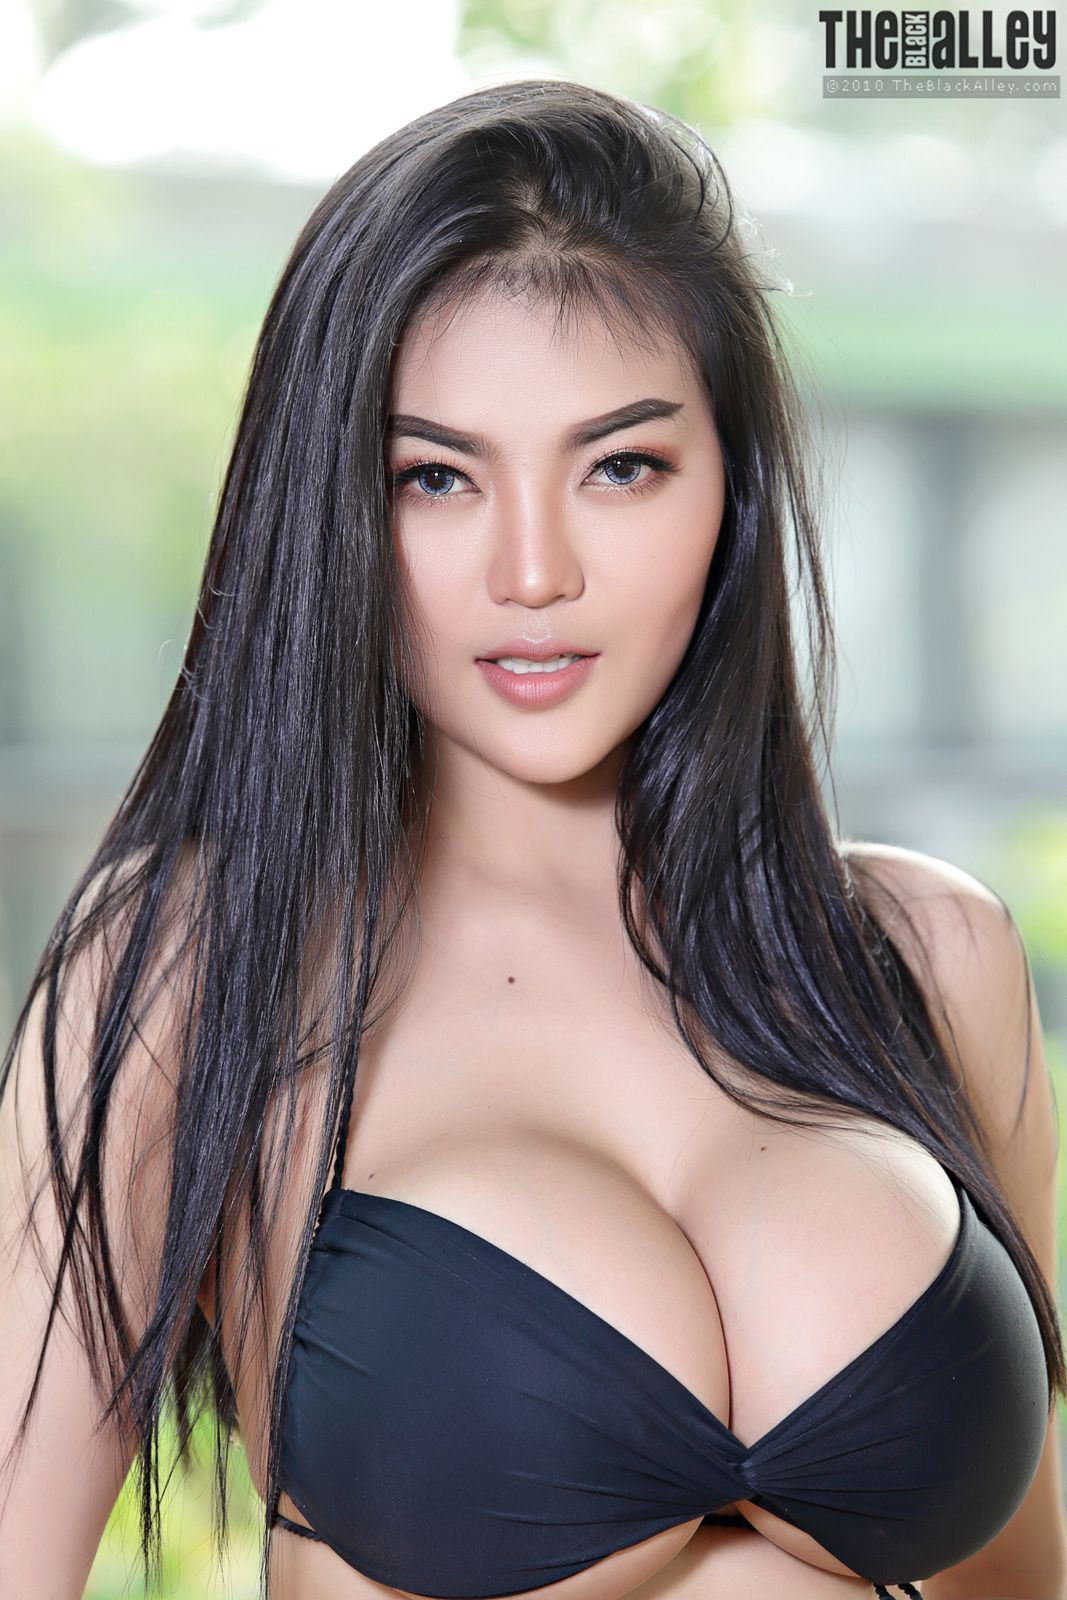 Sexy asian girl wearing black bra stock photo